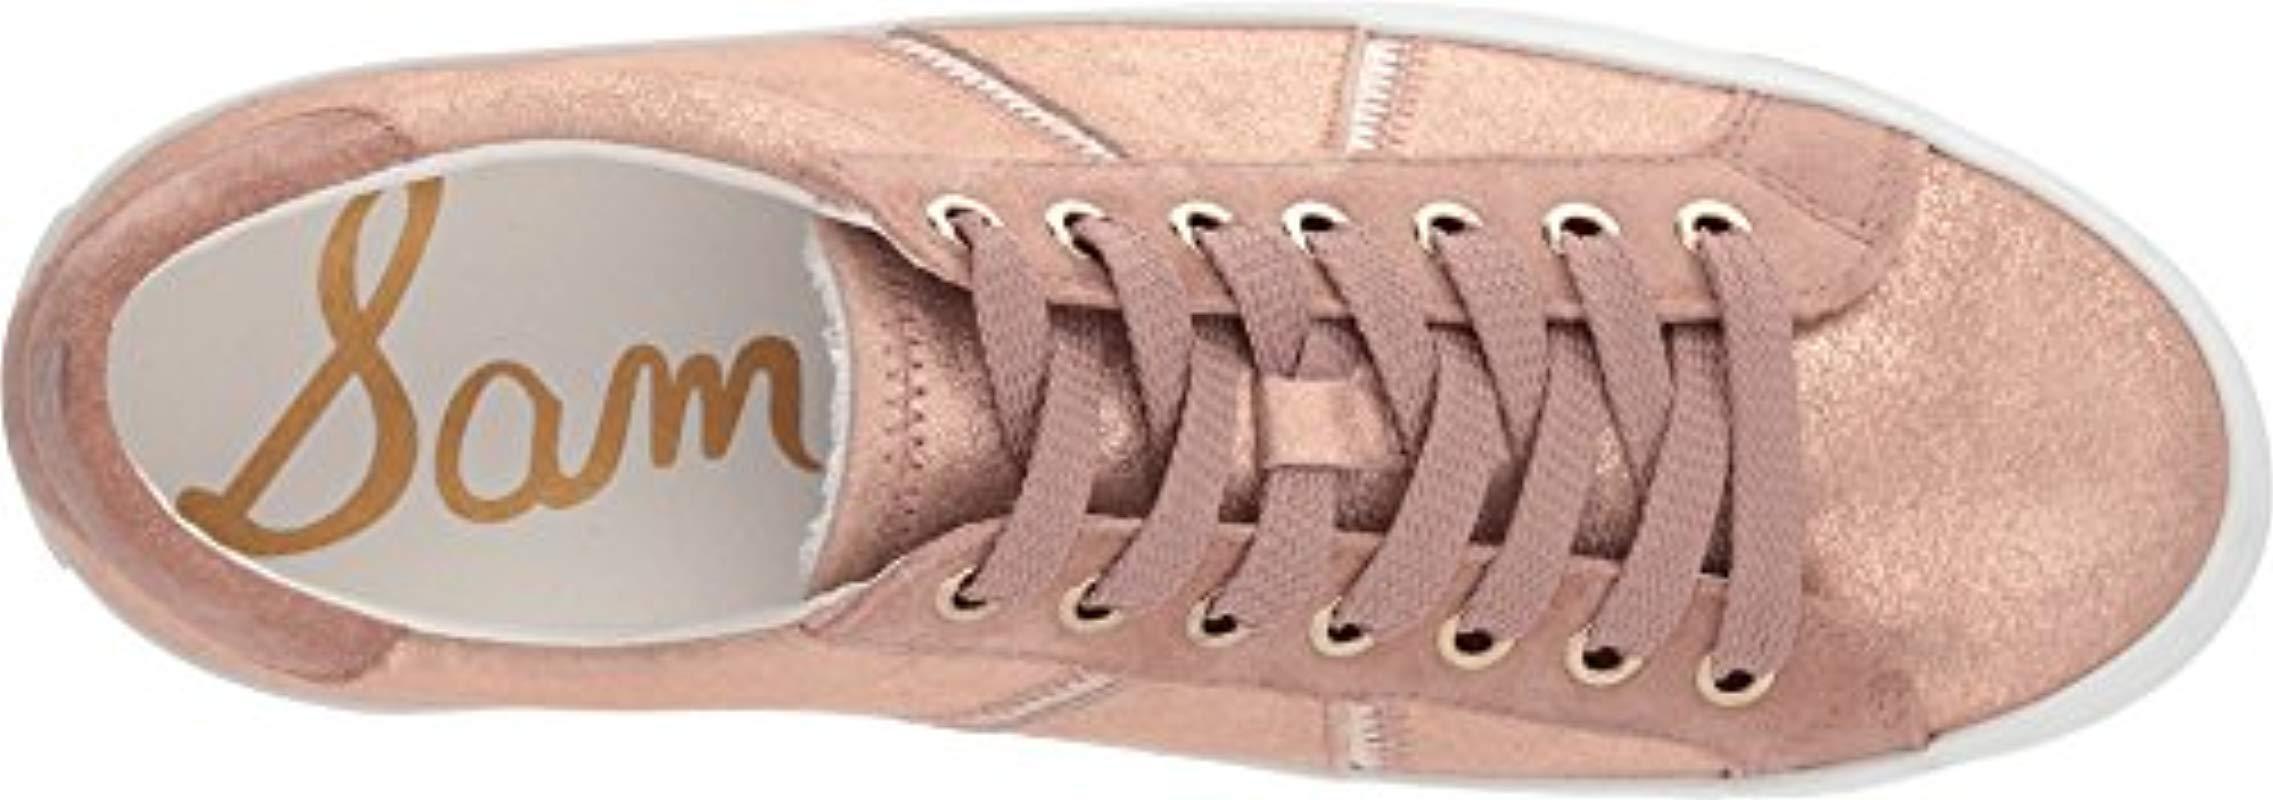 9cda7bddad5abd Sam Edelman - Pink Baylee Sneaker - Lyst. View fullscreen